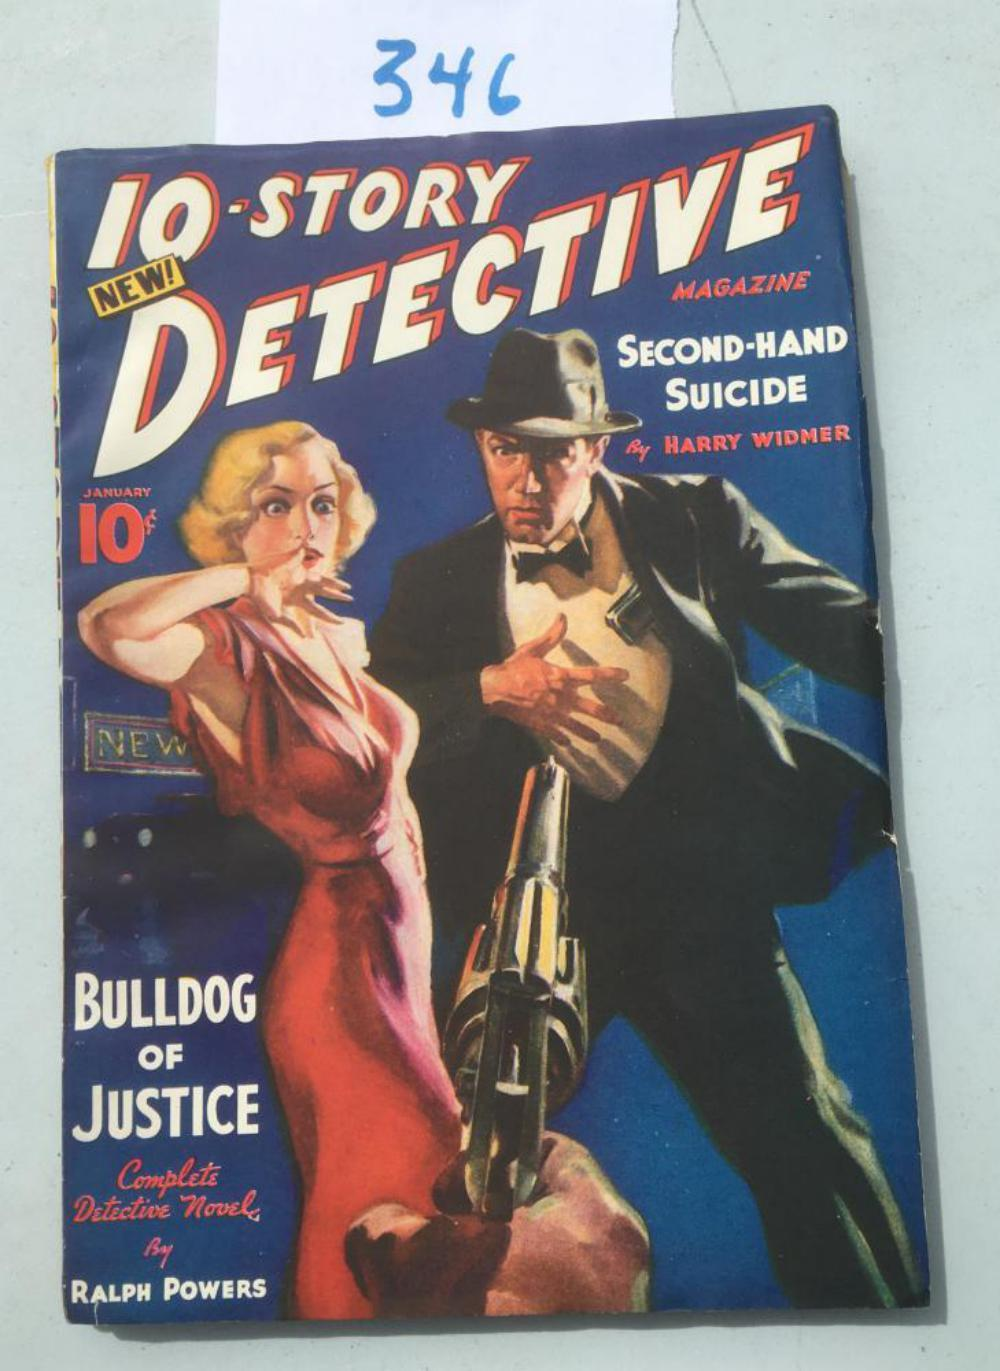 10-Story Detective Volume One. # 1.